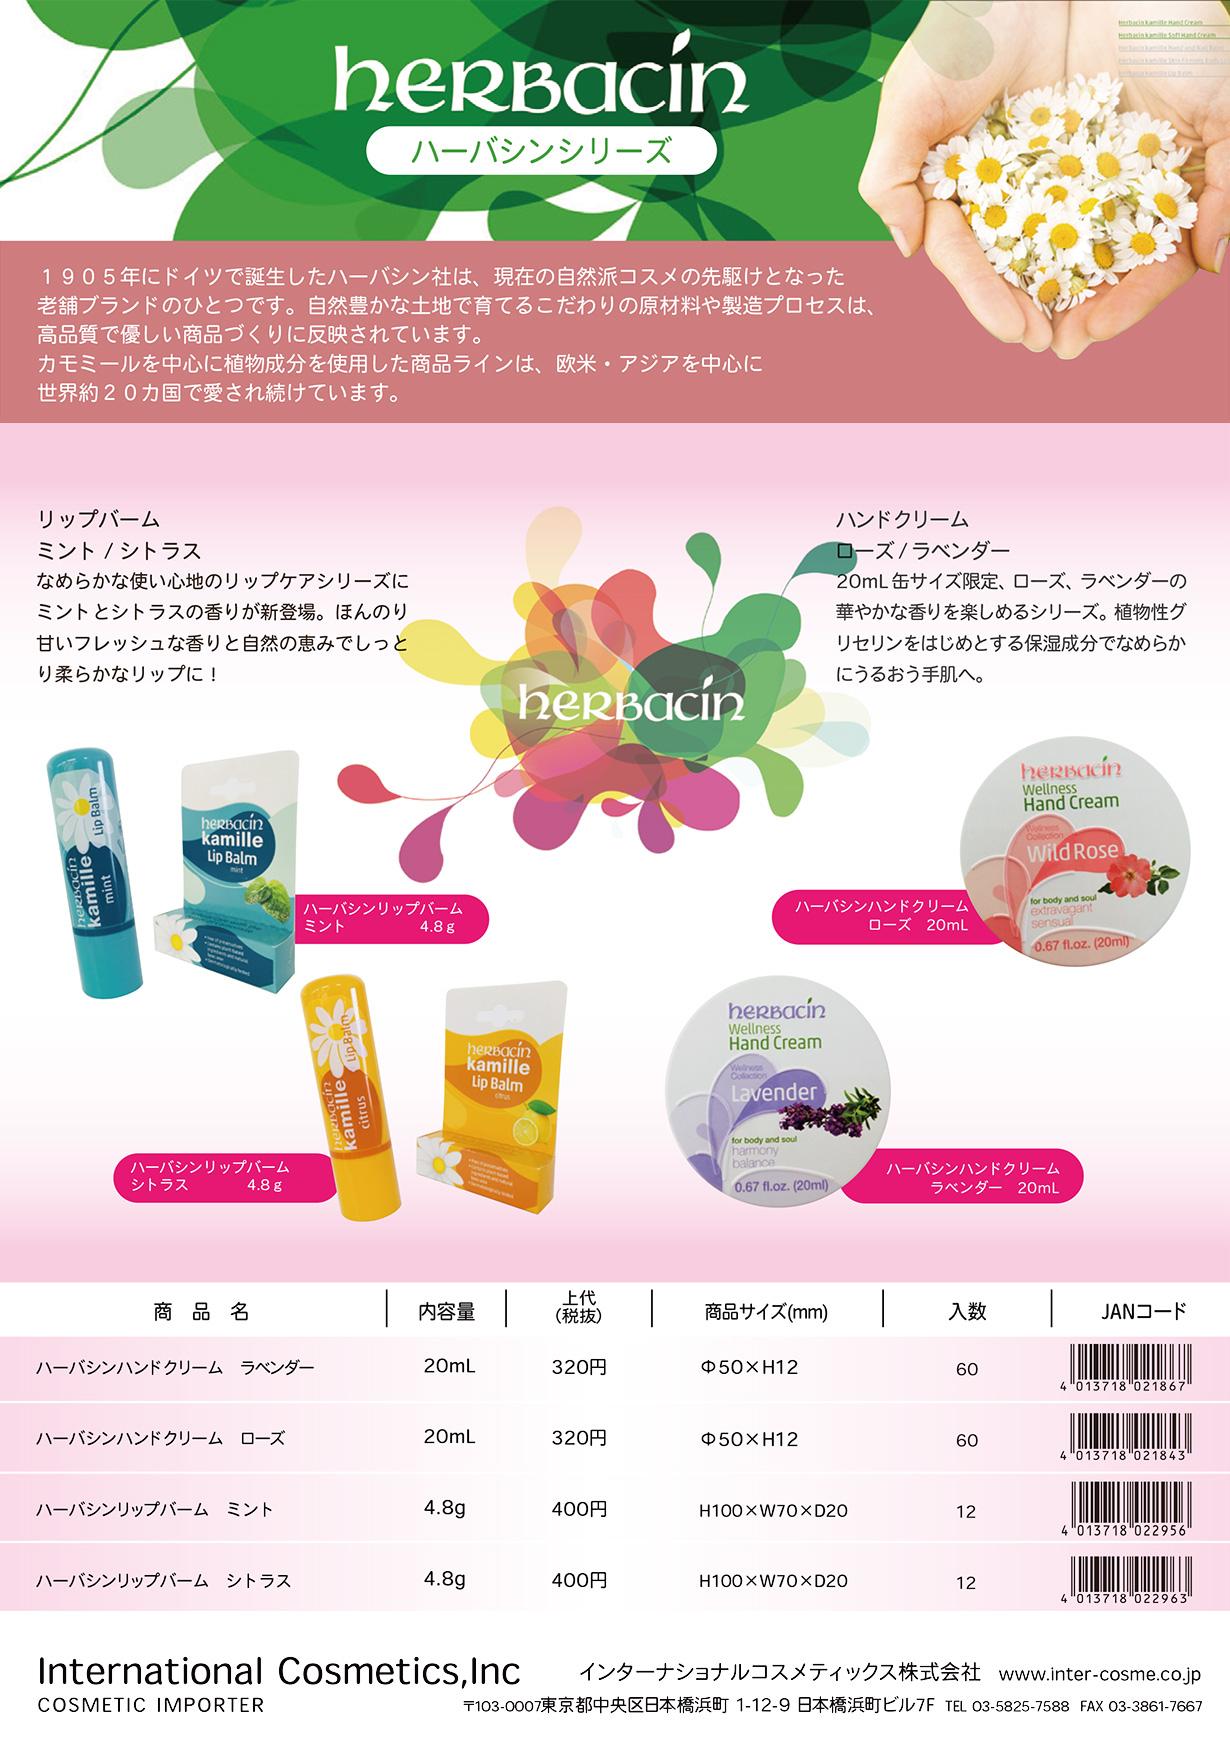 [Catalog] Herbacin Hand Cream & Lip Balm 2018 (Japanese)